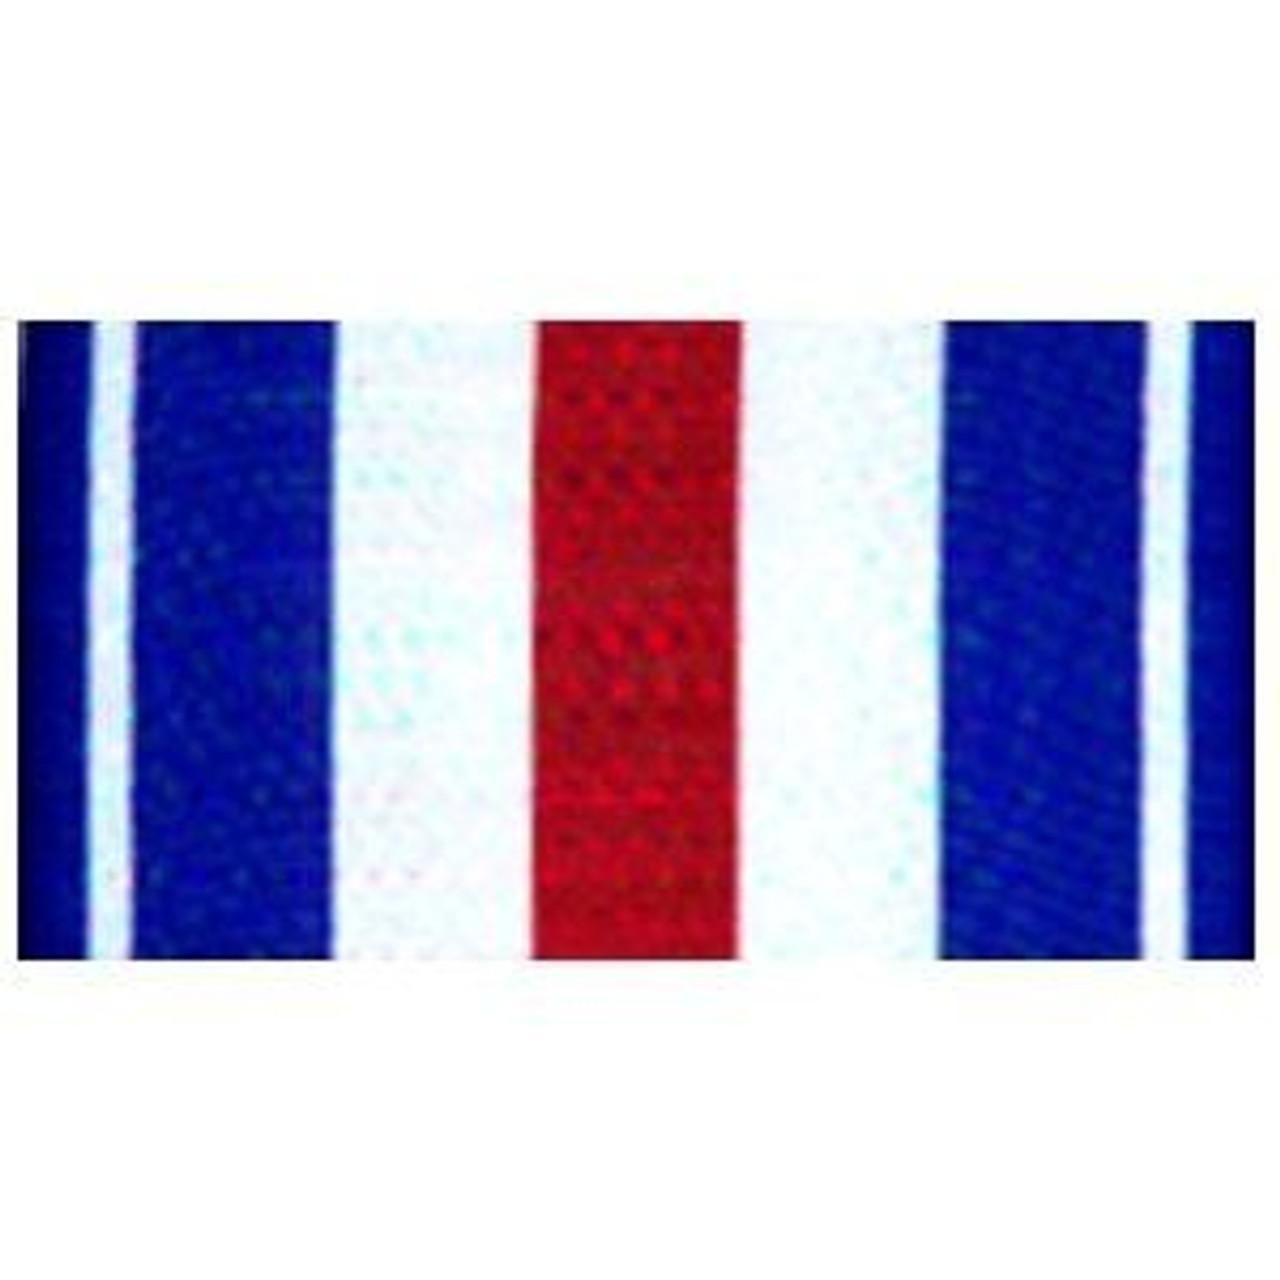 Valorous Unit Commendation Streamer